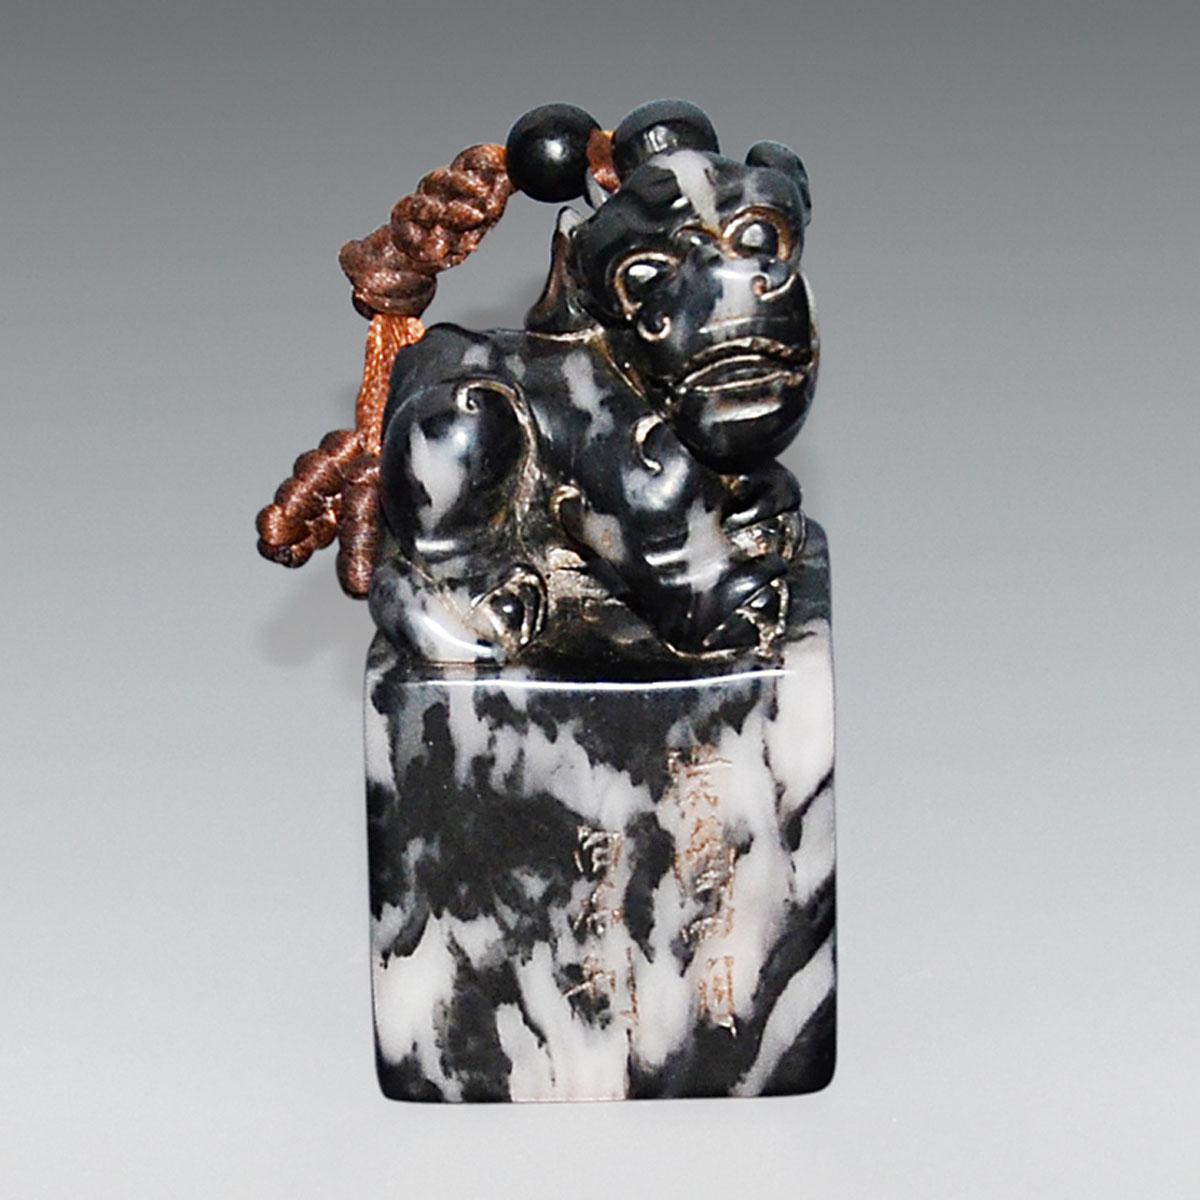 Lot 49 - 壽山石墨地辟邪印章 邊刻(癸酉四月白石刻) 印文(半牕雪月梅花) A Dark Shoushan Stone Seal with Carved Bixie As Knob. Height: 3